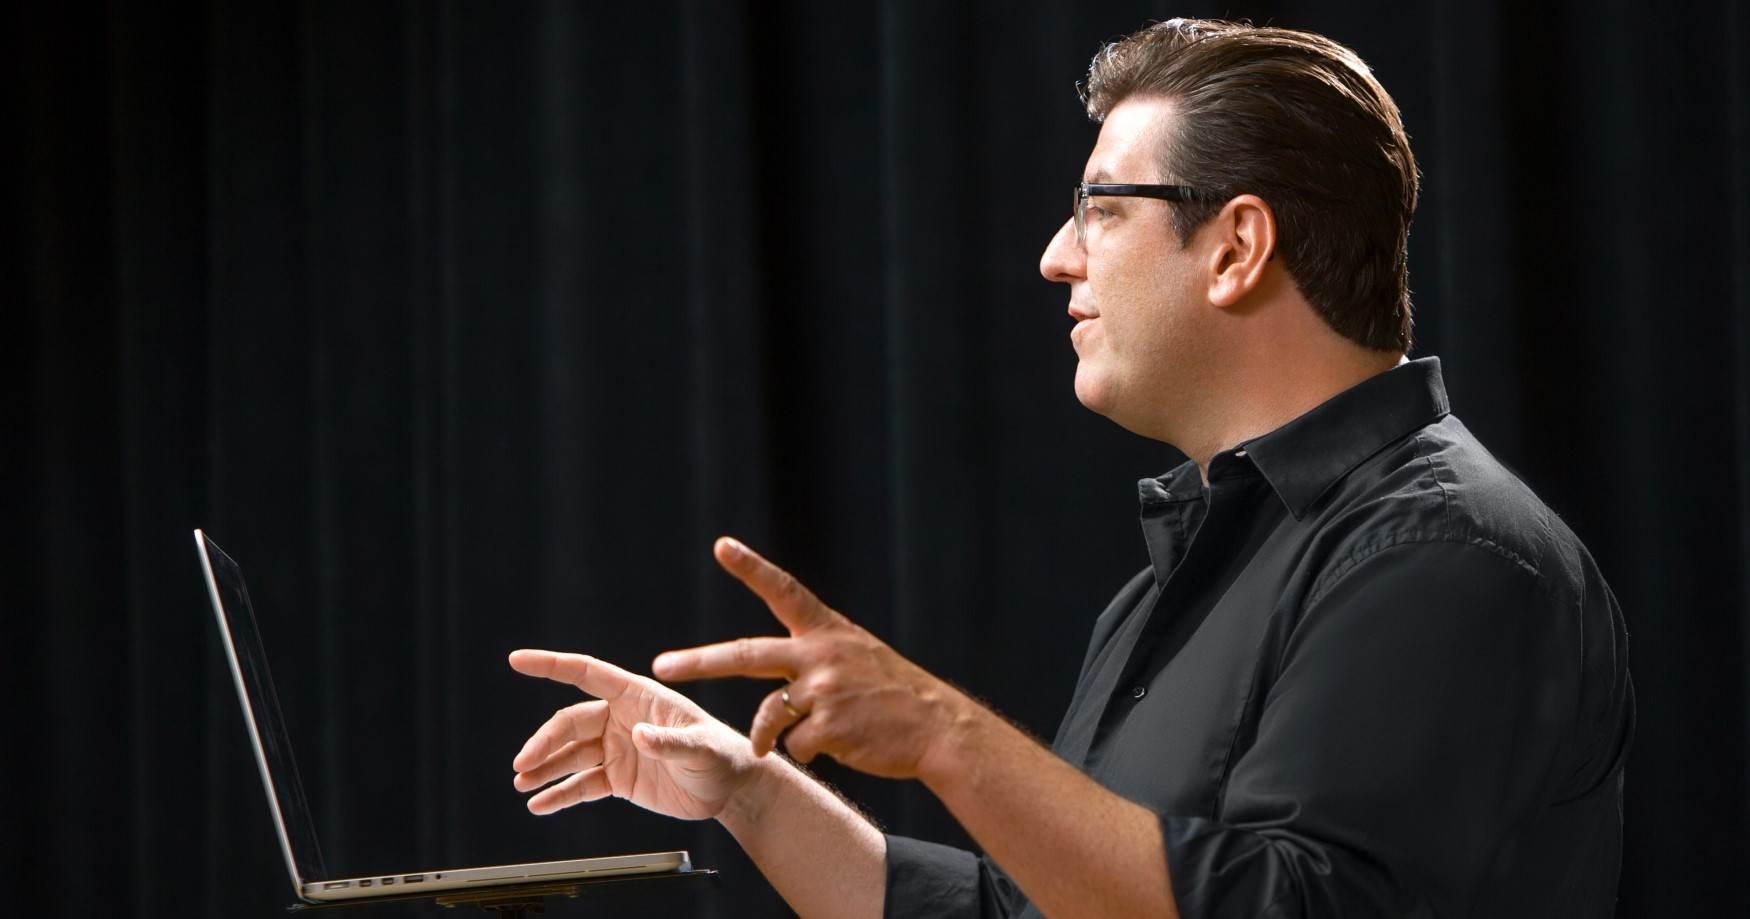 Composer Jeff Morris at the podium